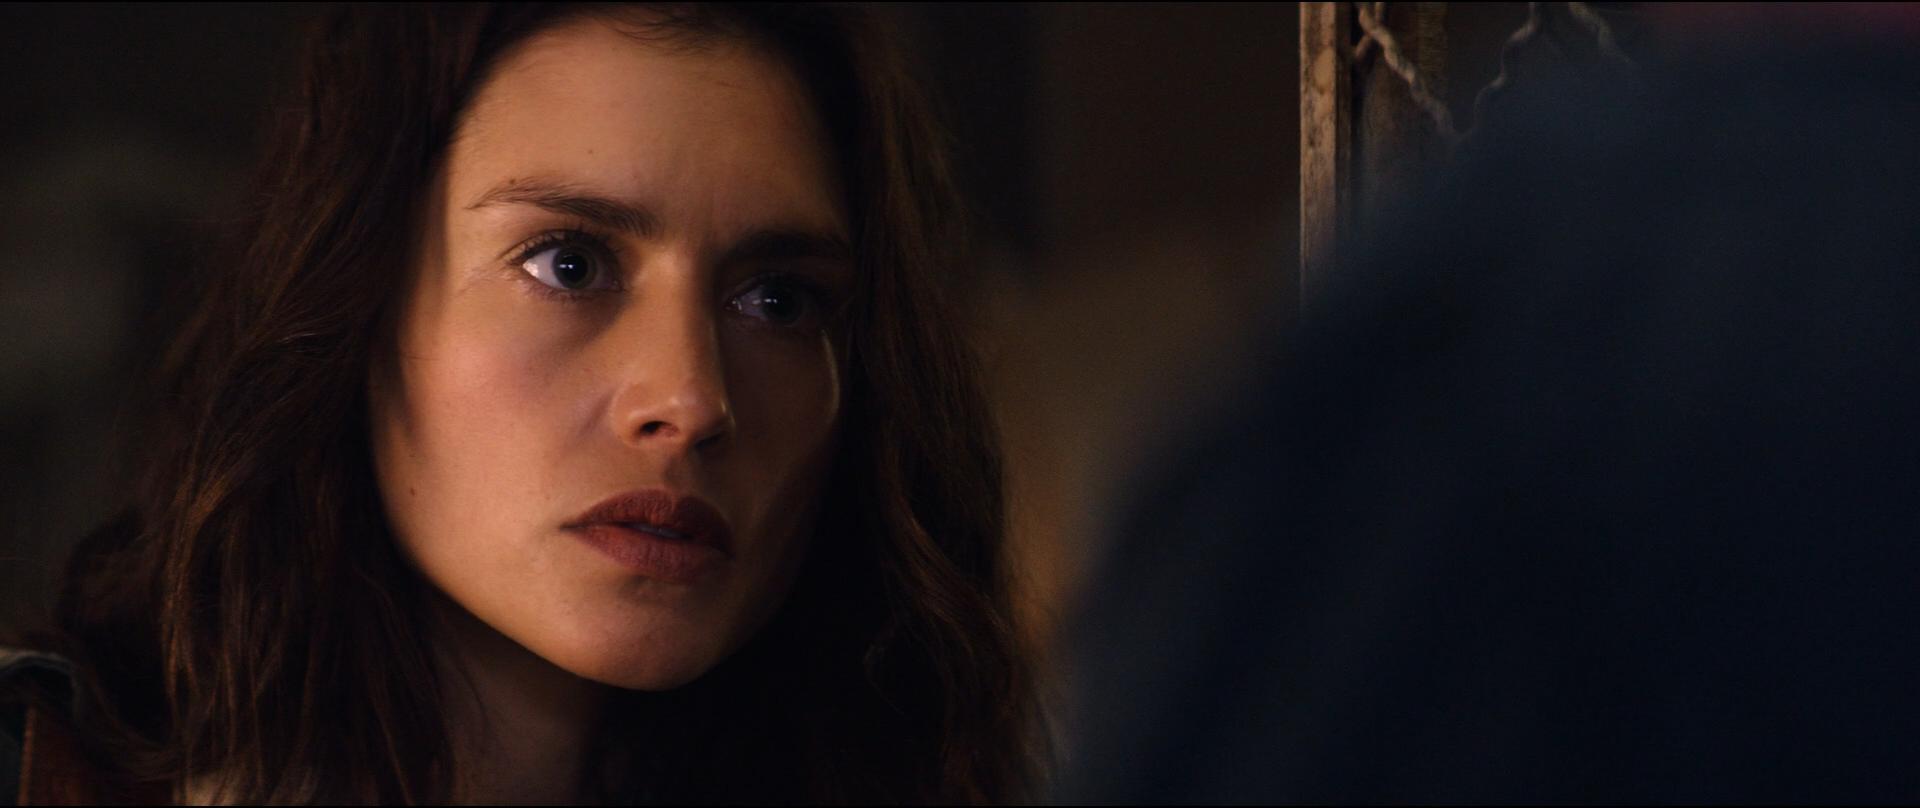 Hitman: Agent 47 - Tetikçi: Ajan 47 2015 (Bluray 1080p) DUAL TR -EN - HD Film indir